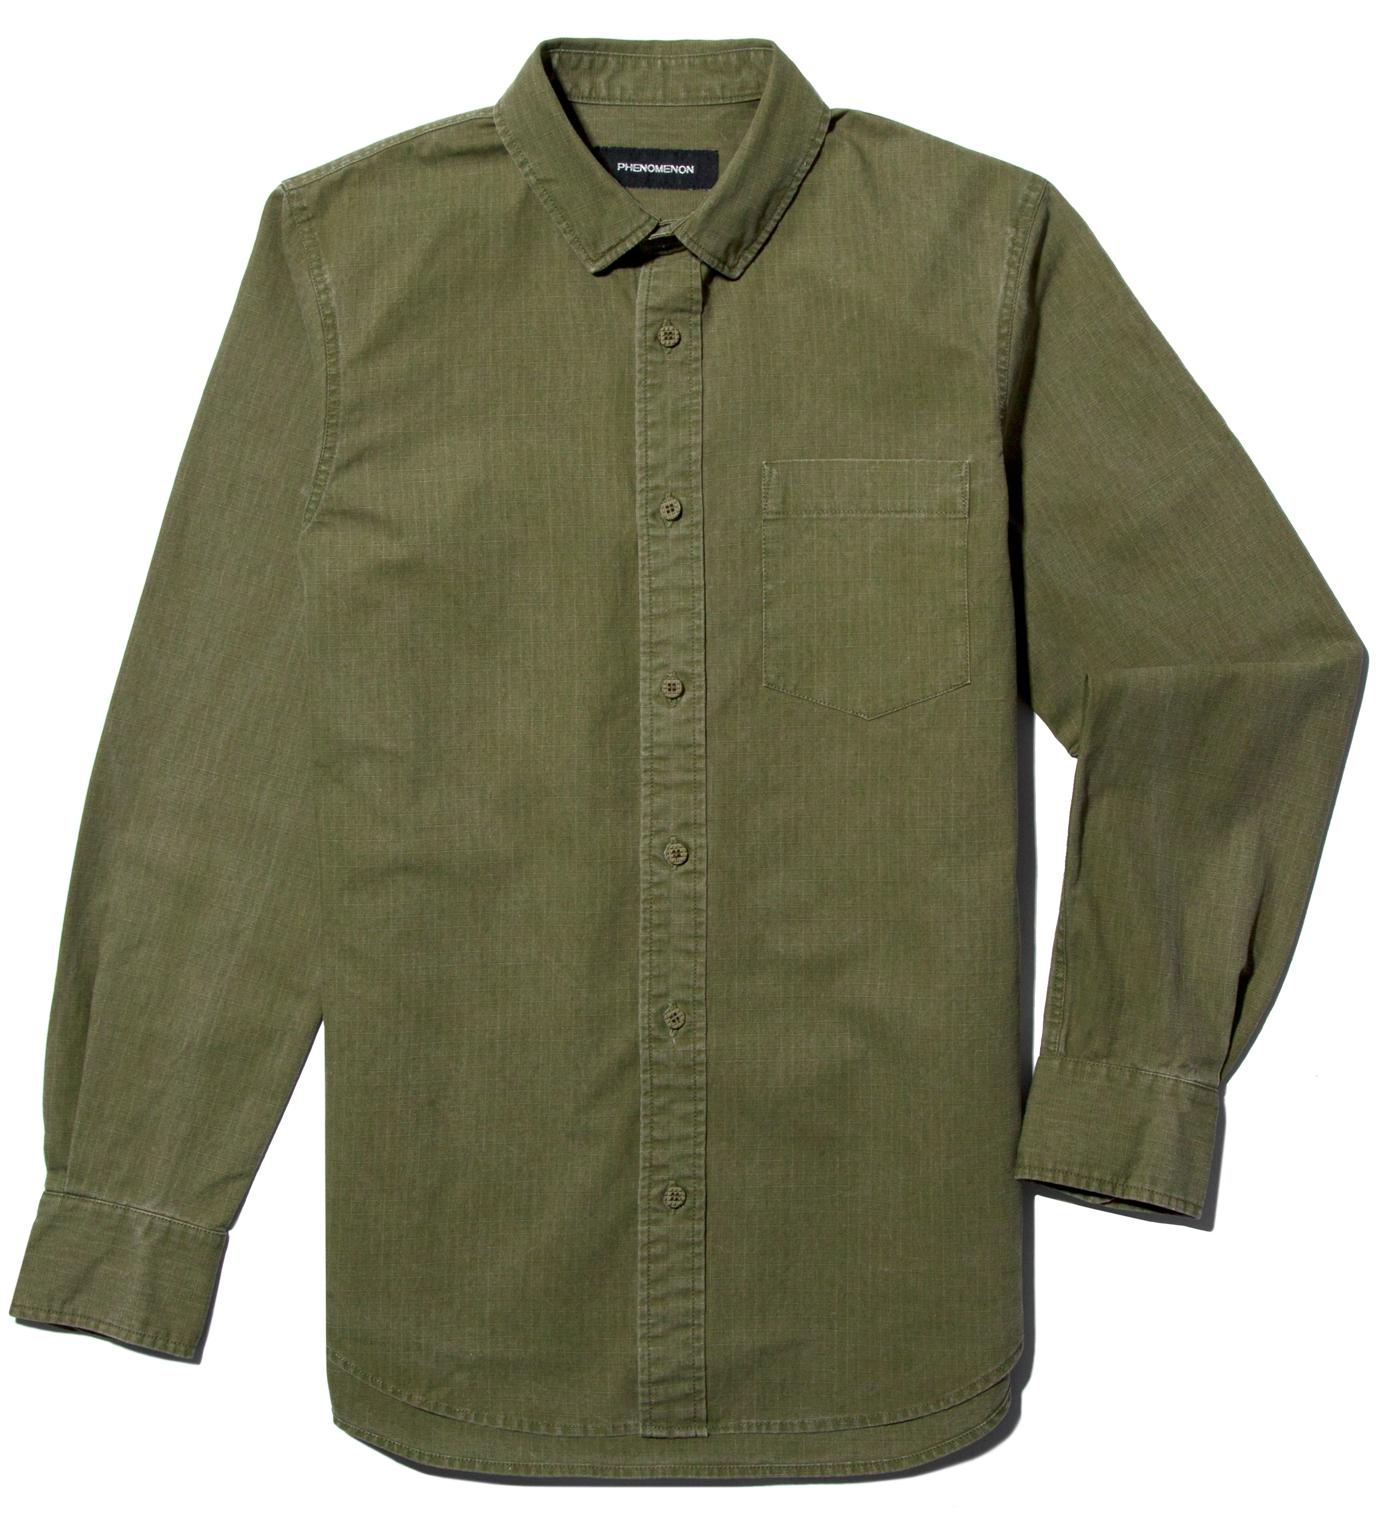 PHENOMENON Moss Green Cotton Ripstop Button-Down Shirt